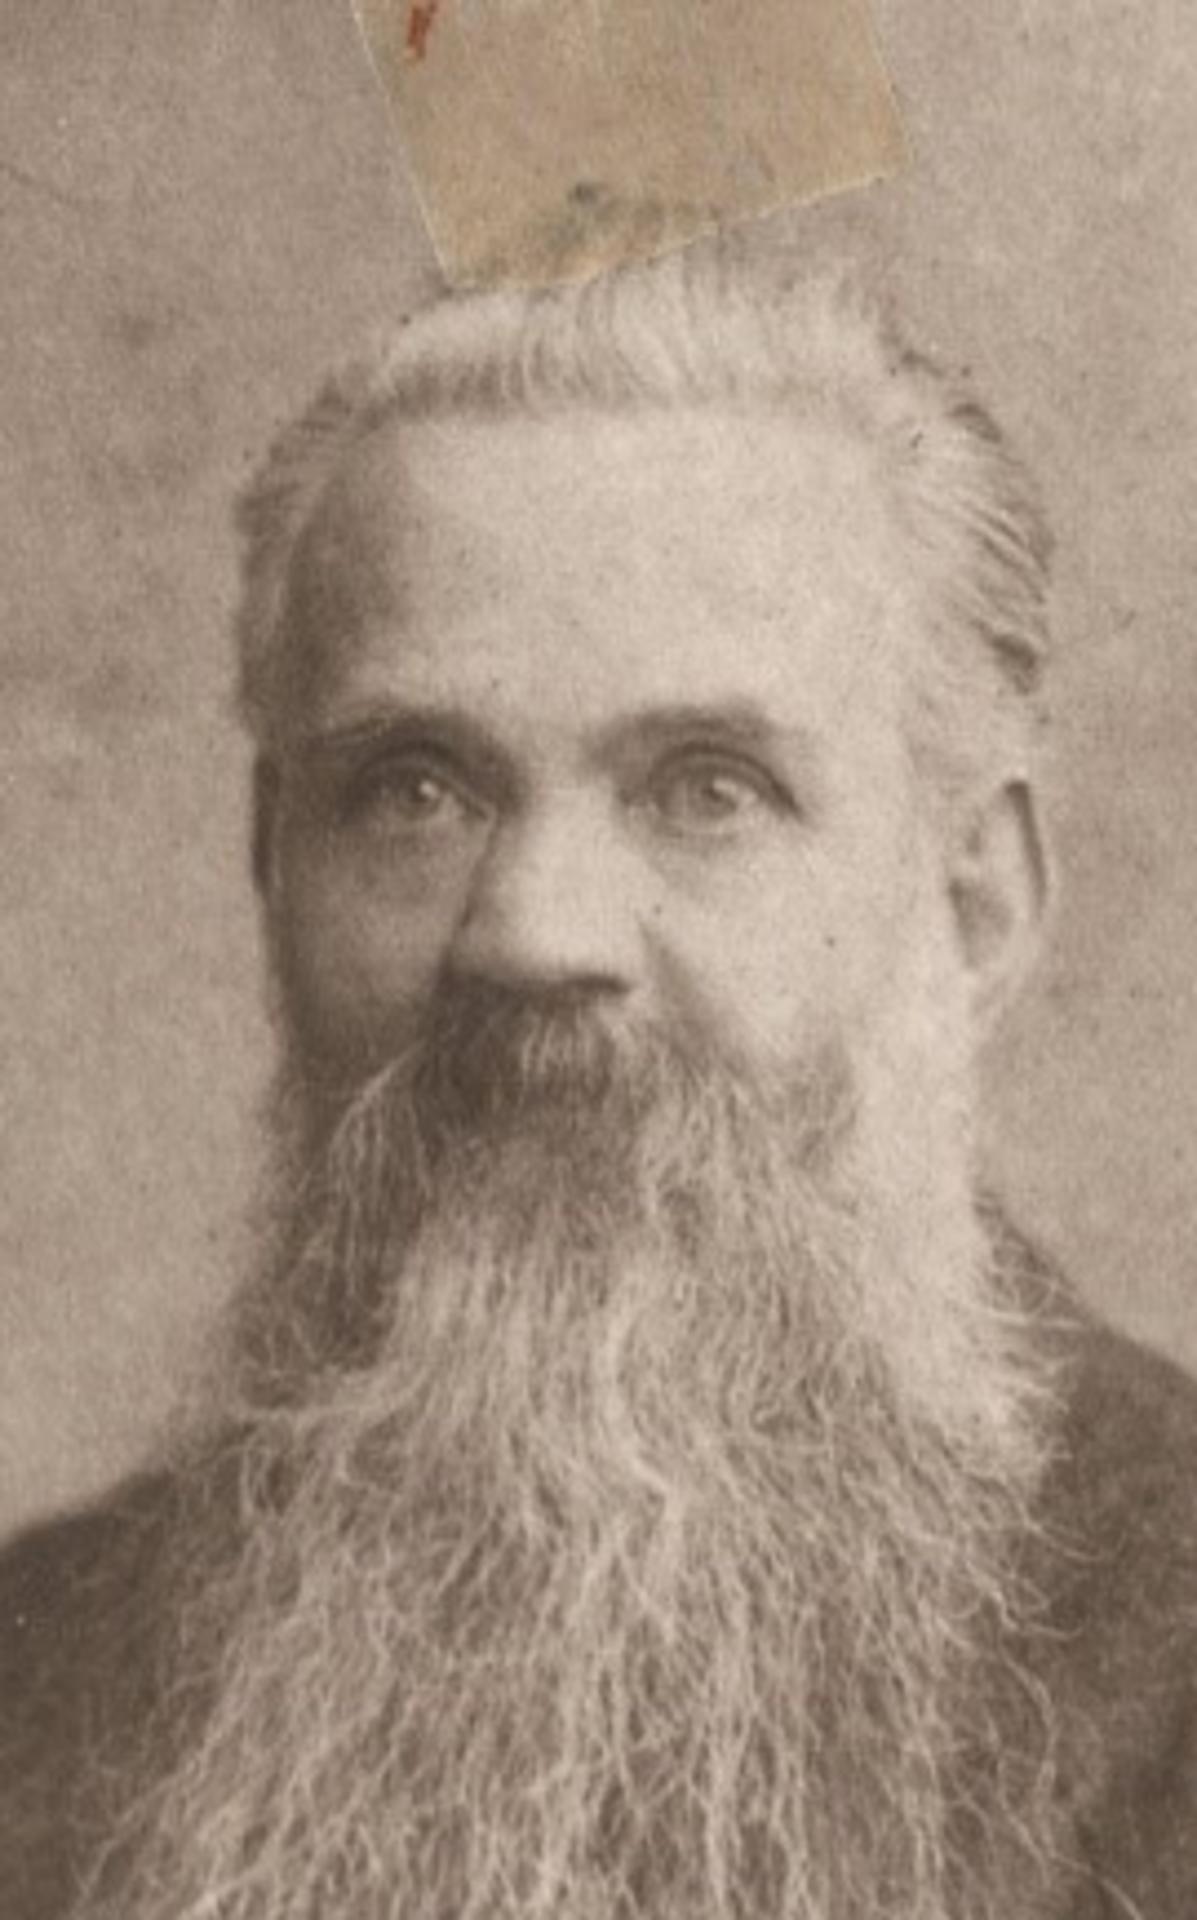 William Jarman